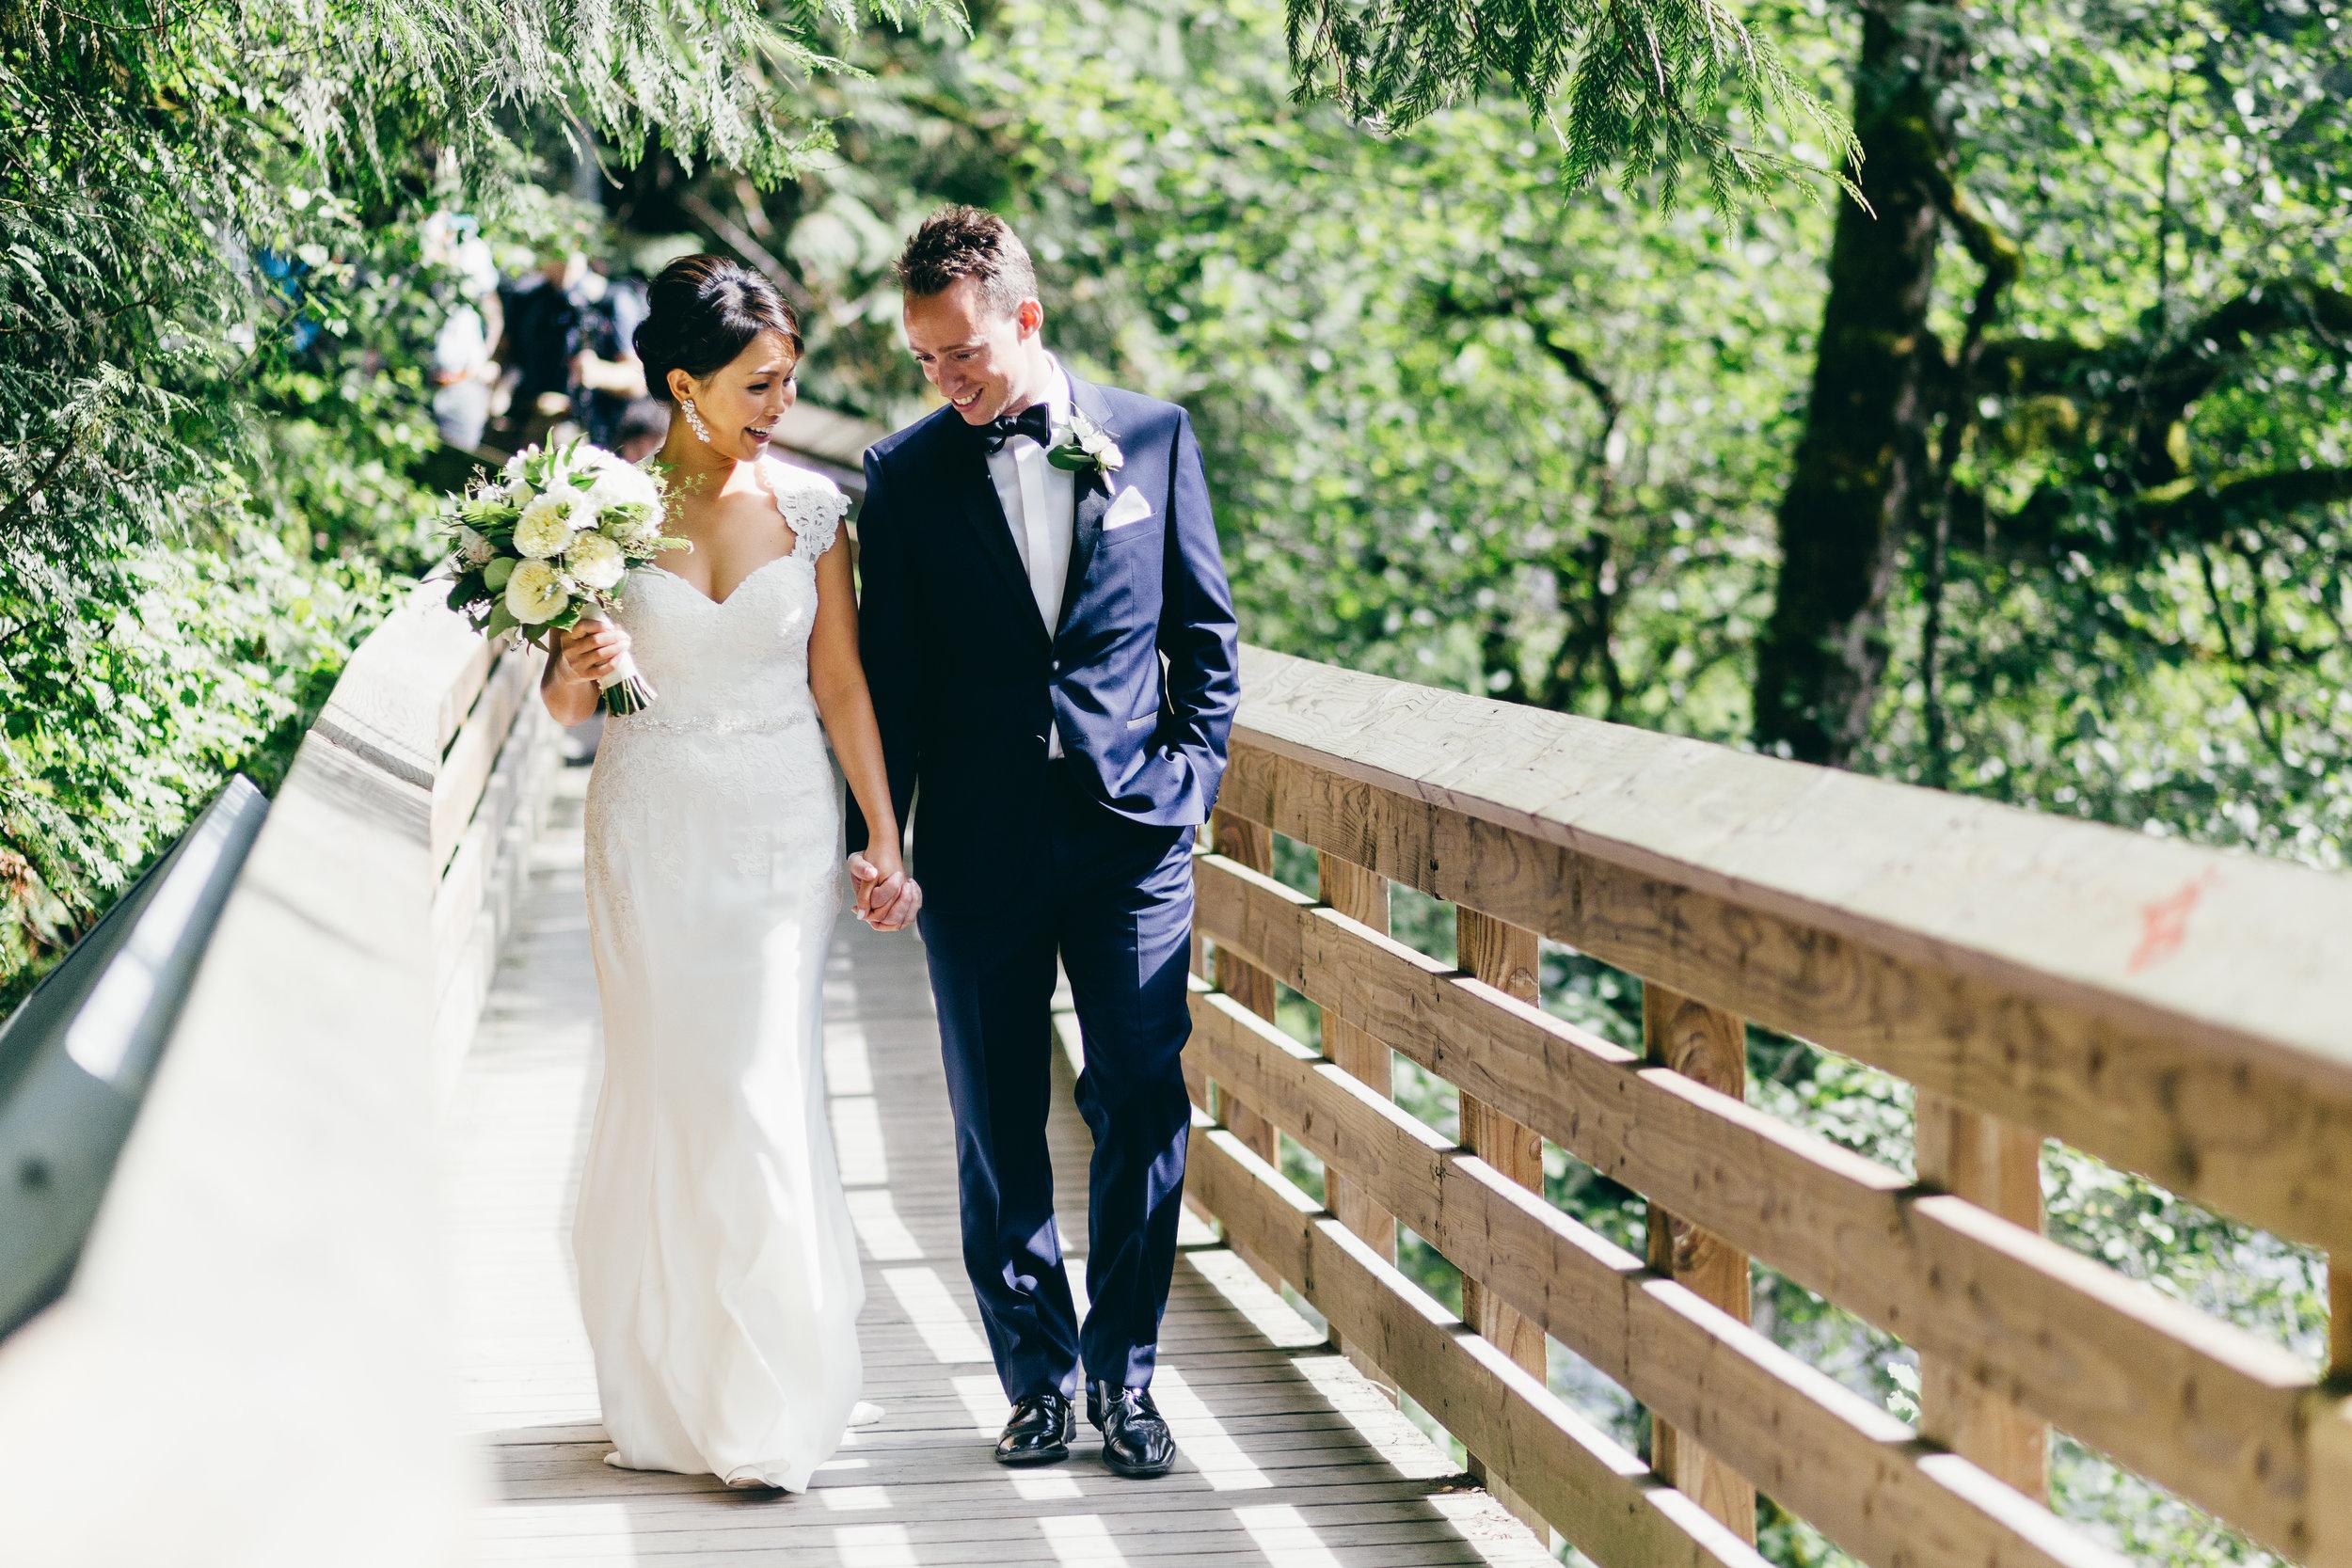 jackie-joakim-wedding-portraits-0055.jpg